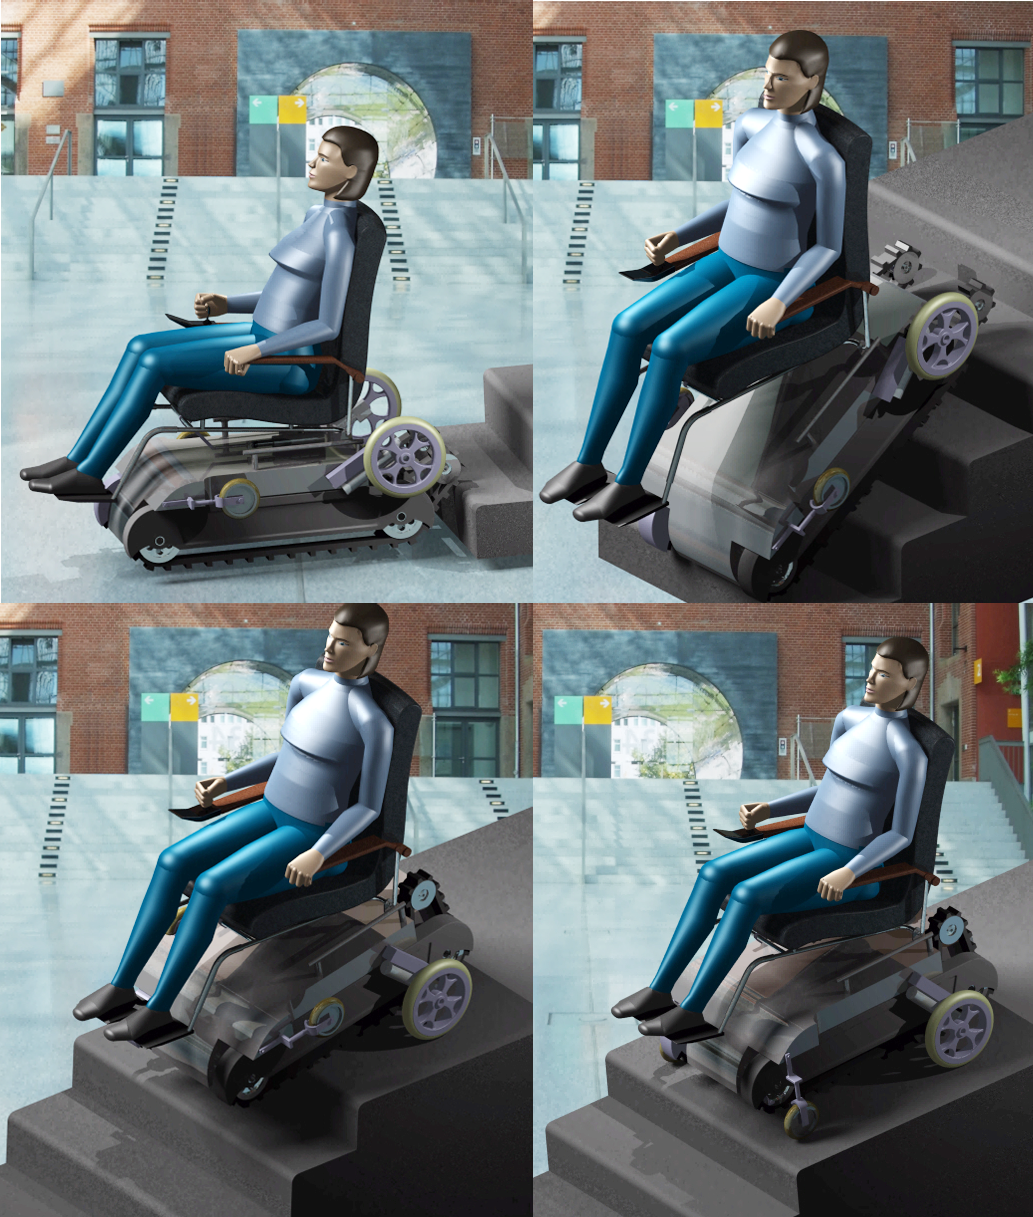 Stair Climbing Wheelchair :: Create the Future Design Contest